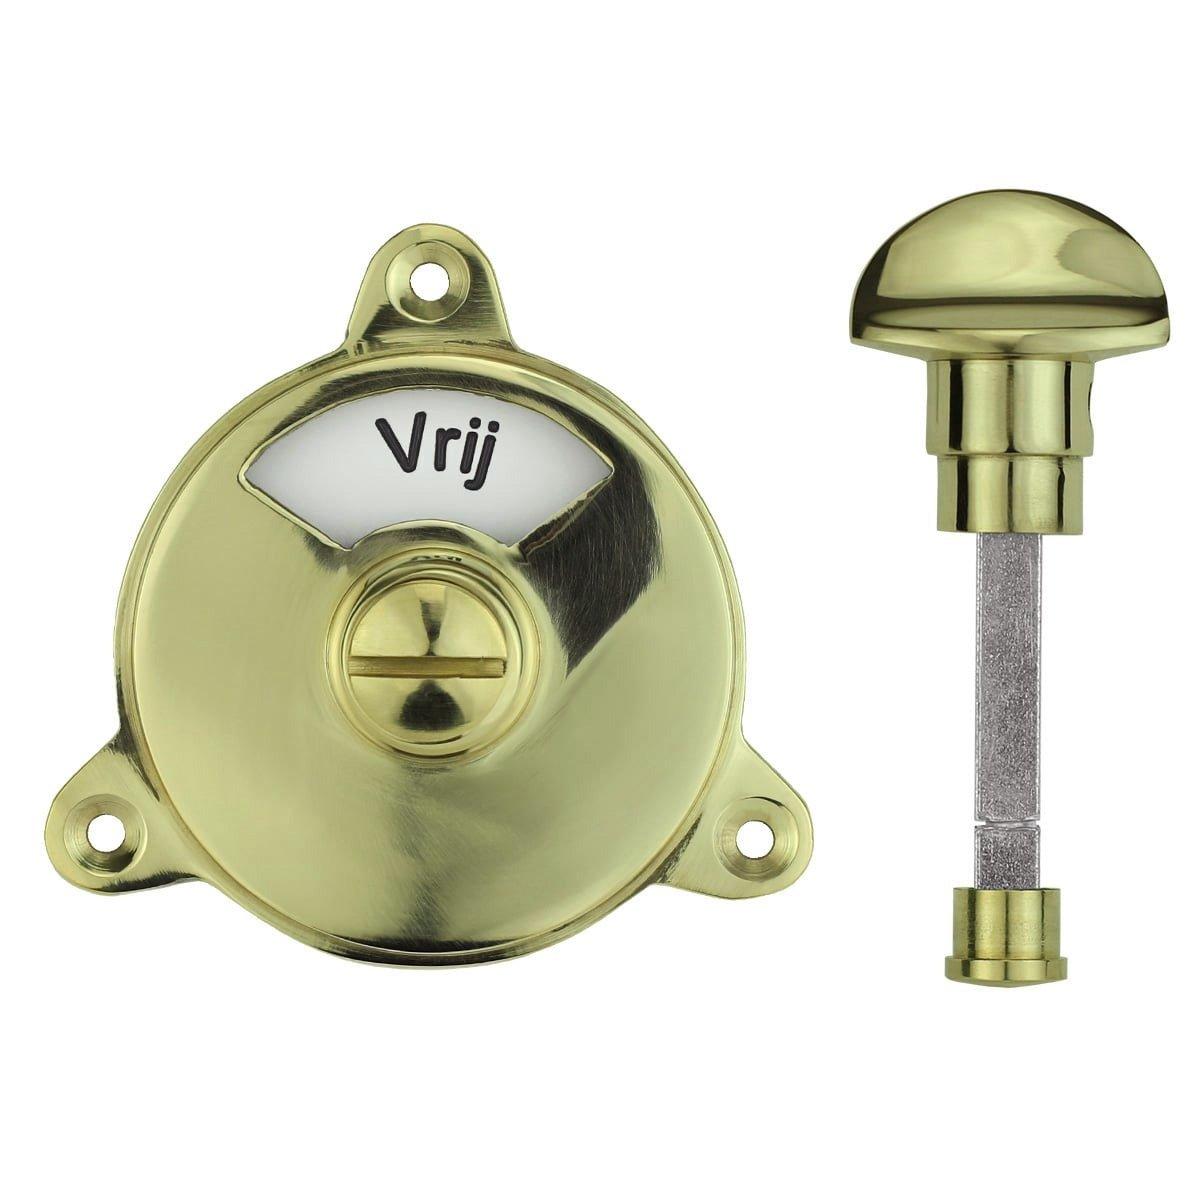 Hardware Toilet Locks Toilet lock round polished brass - Ø 58 mm